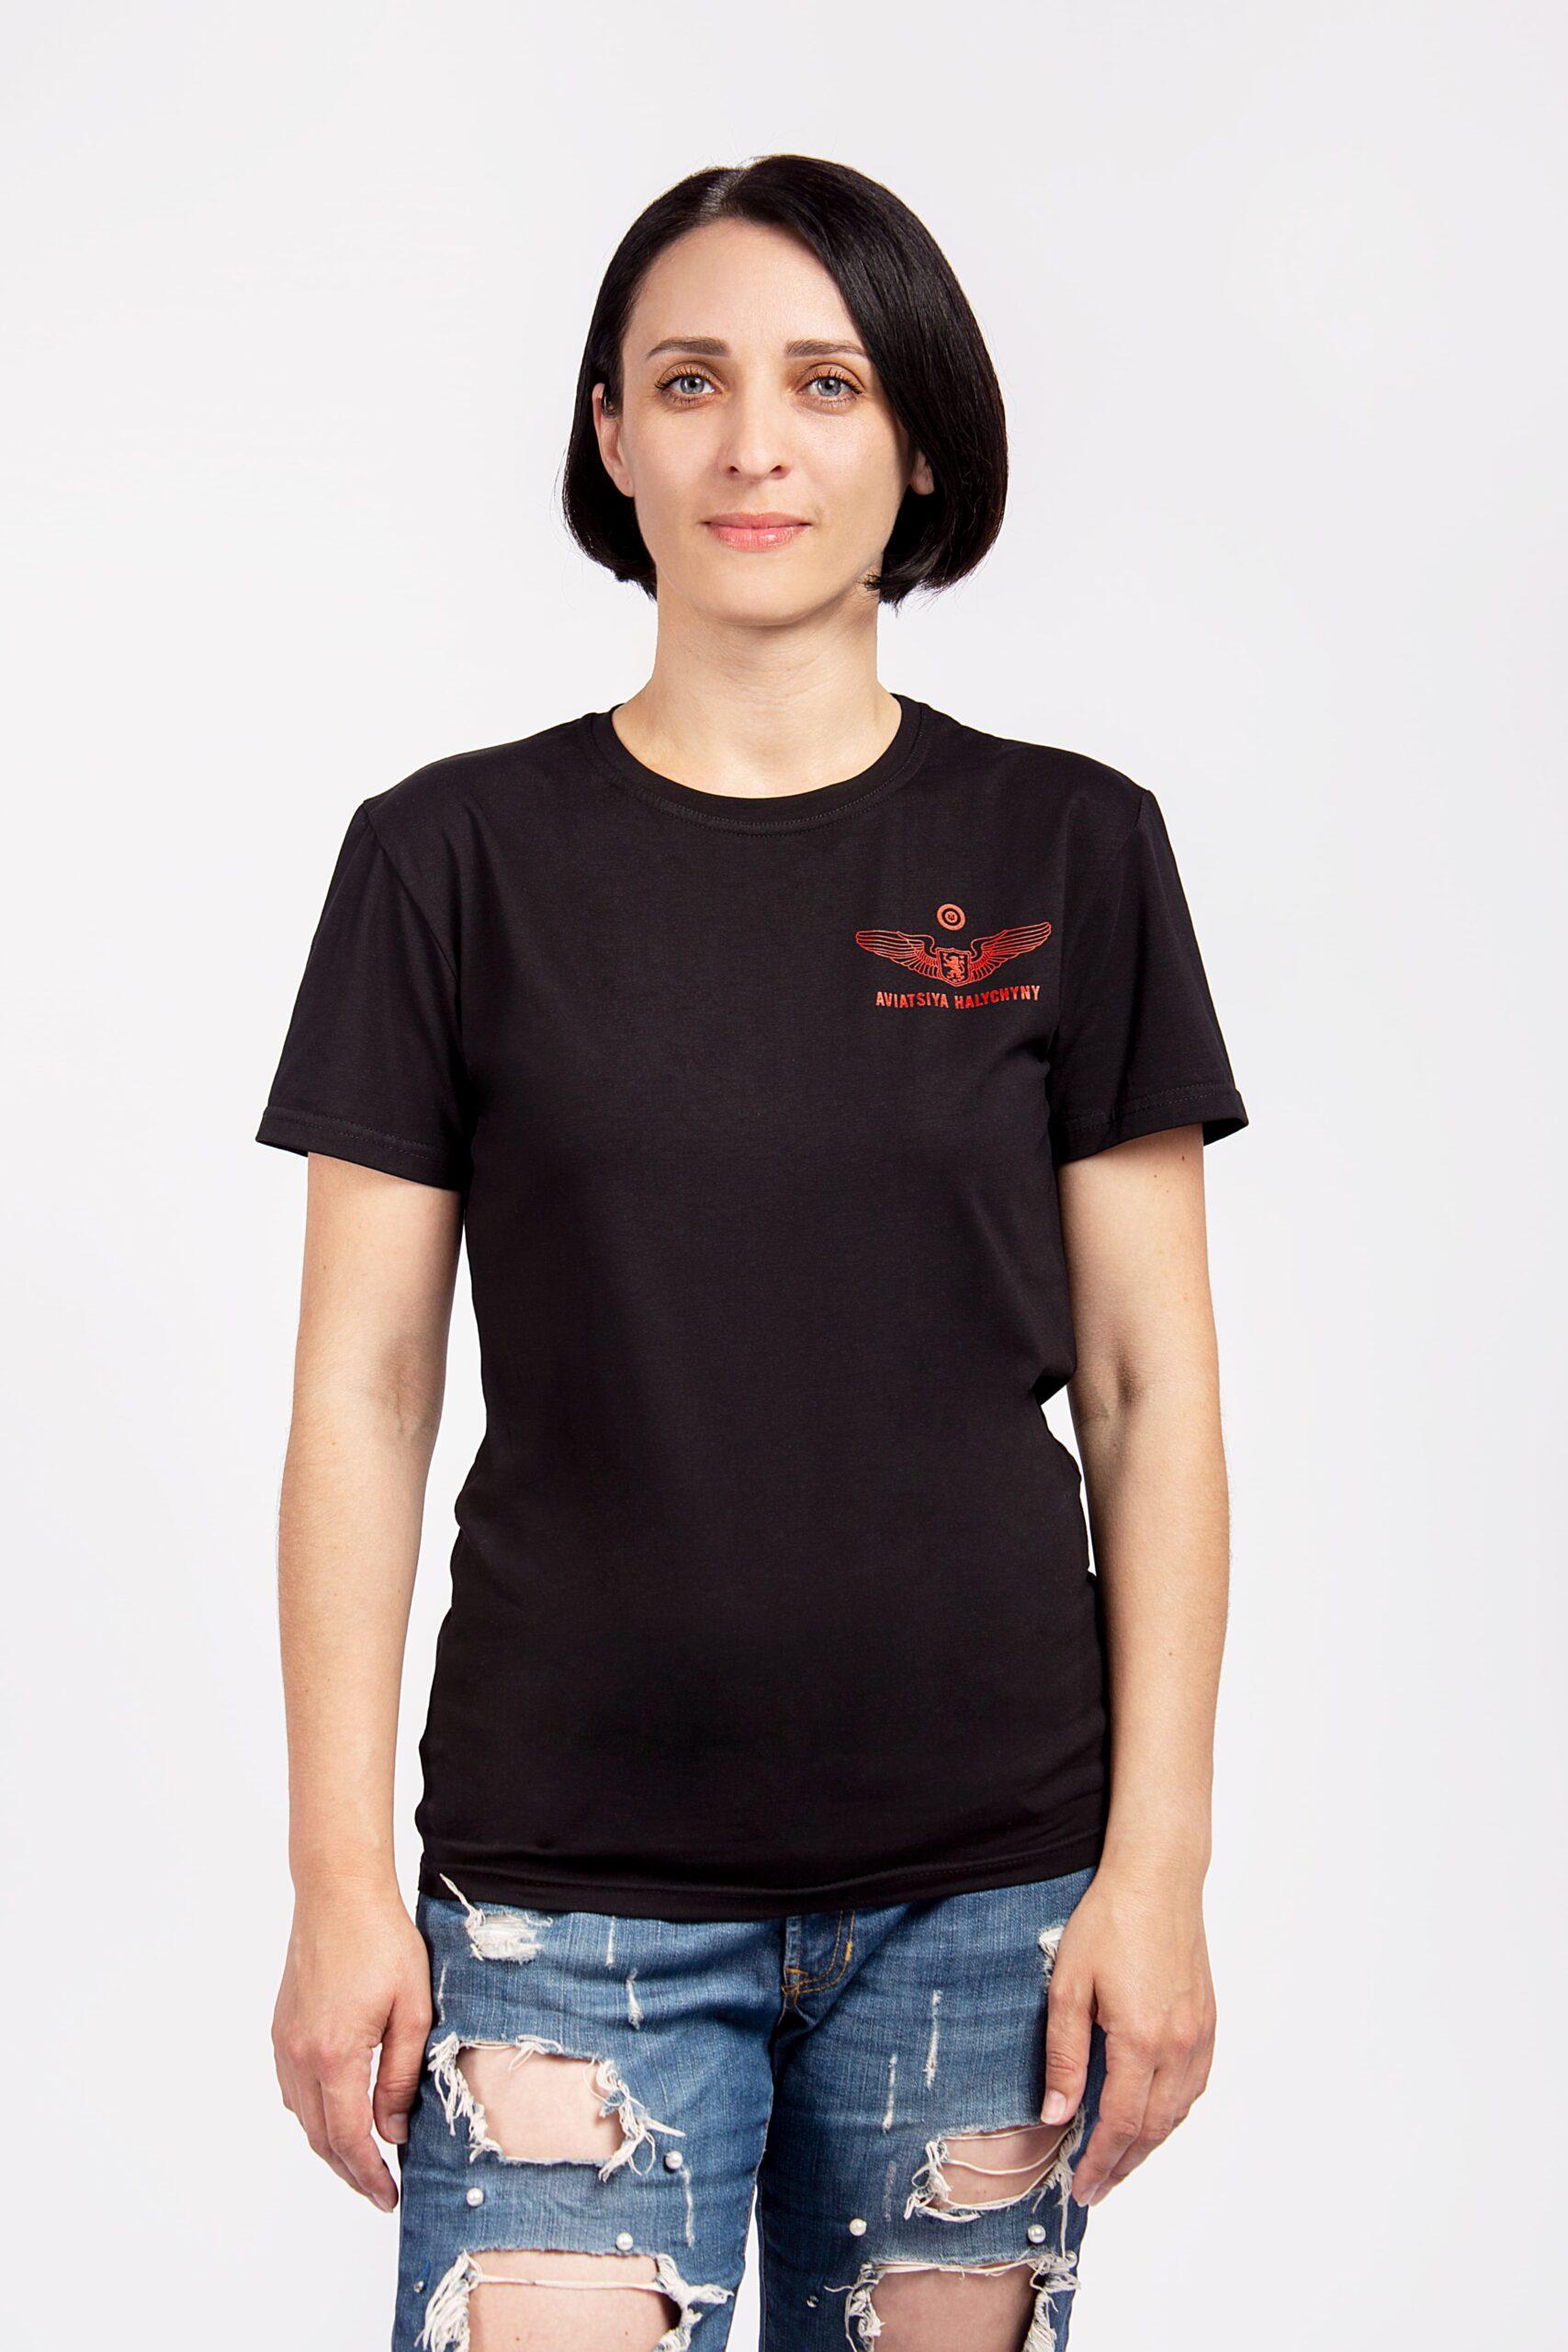 Women's T-Shirt From Ukraine With Love. Color black. T-shirt celebrates 75th anniversary of Antonov company.